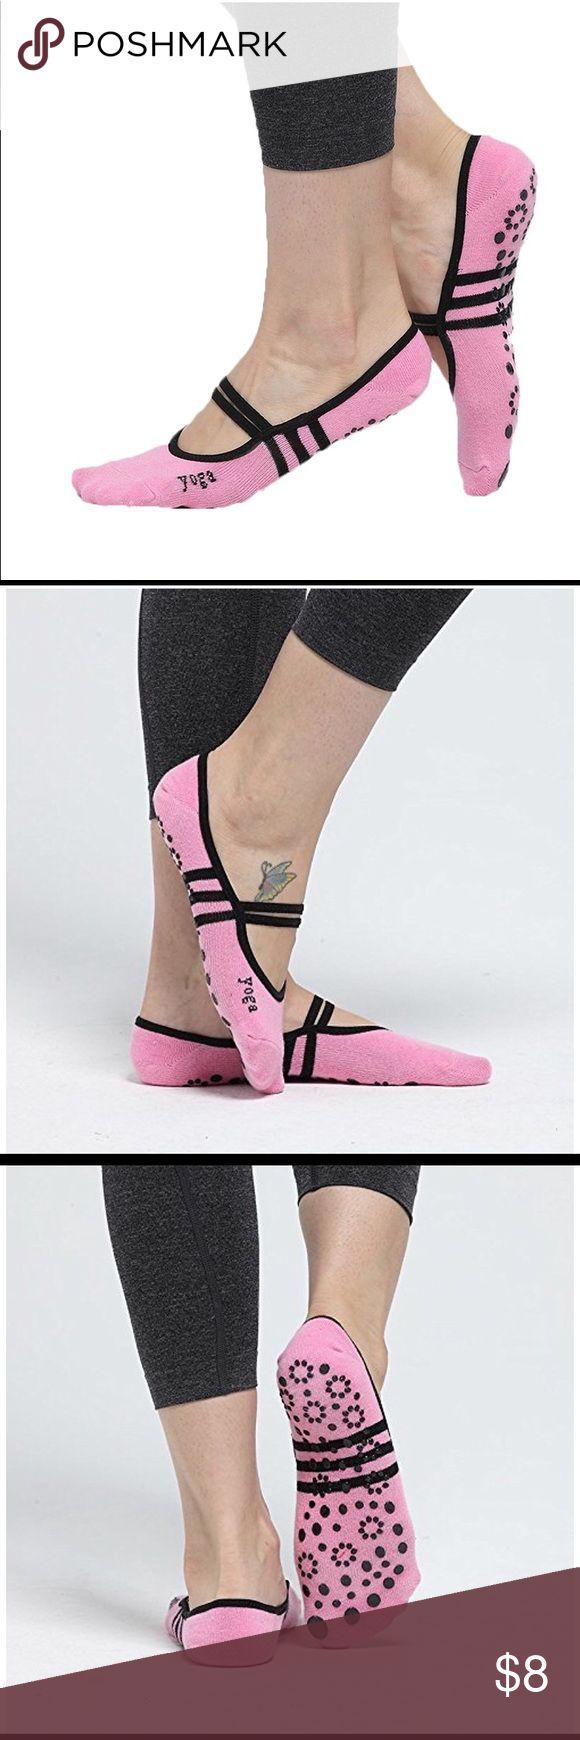 Non- slip women yoga socks Perfect for yoga, Pilates and ballet. 💯 cotton Accessories Hosiery & Socks